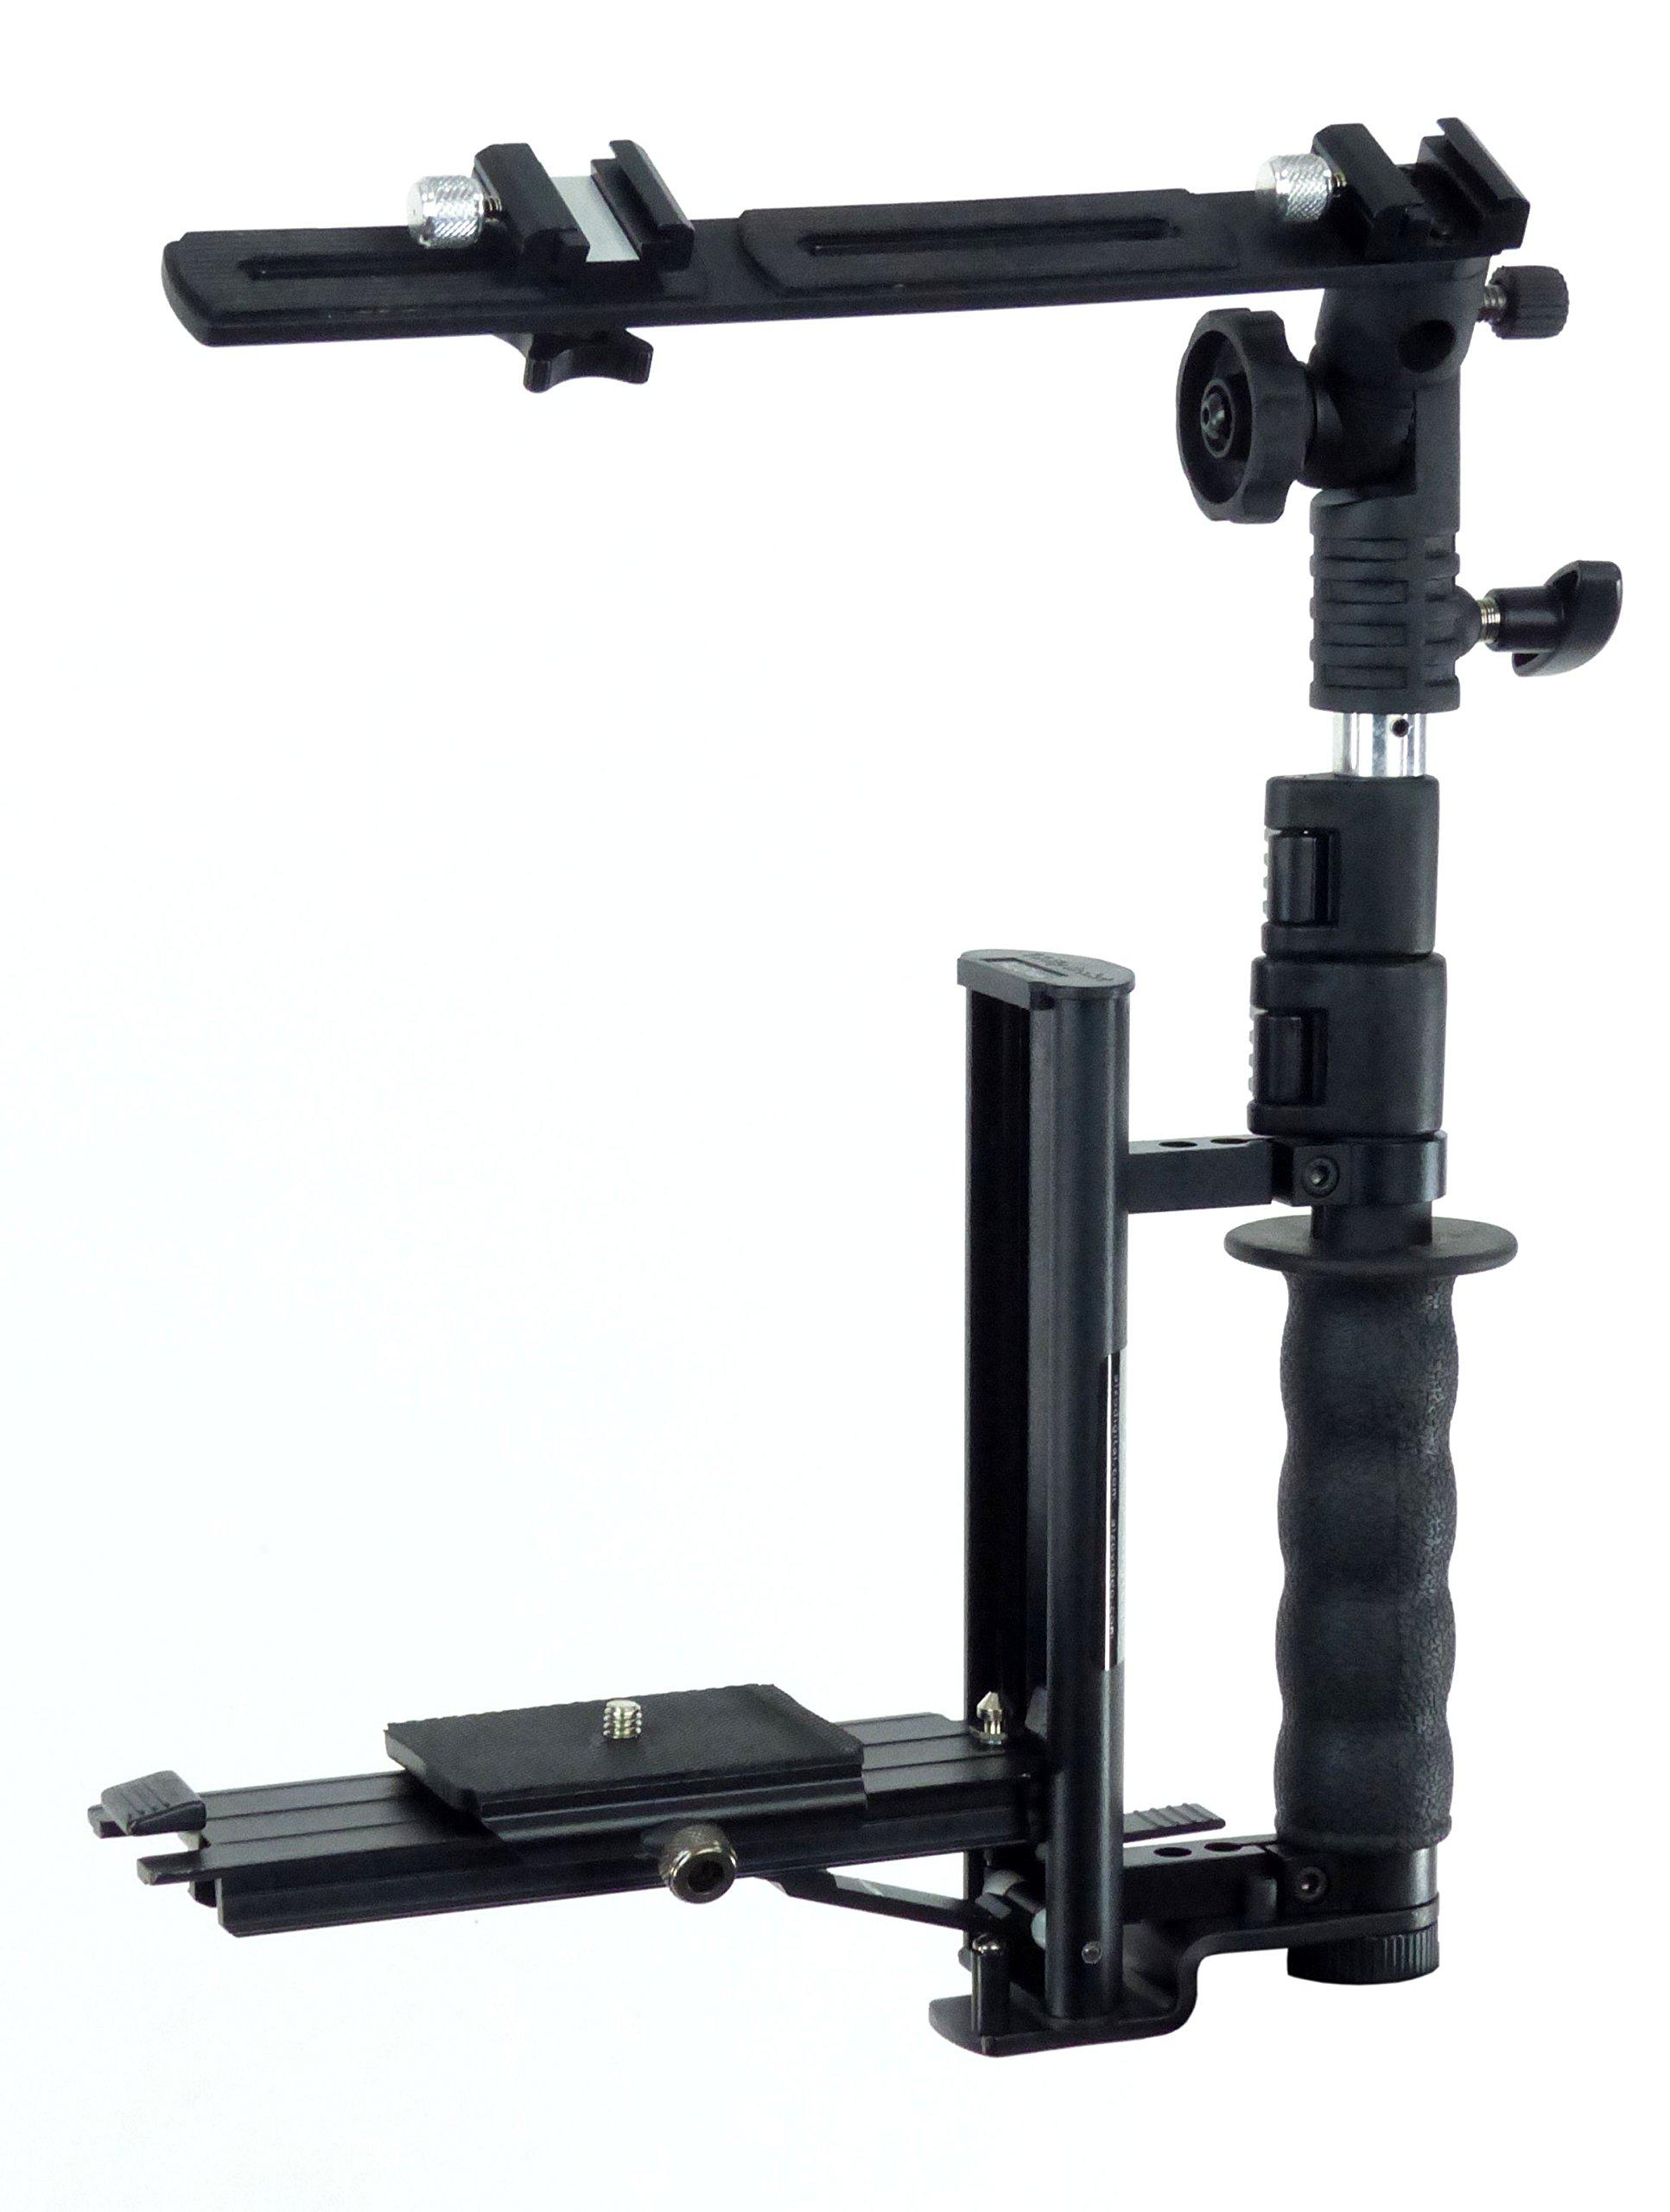 Alzo Flip Flash Bracket for Nikon Cameras by ALZO digital